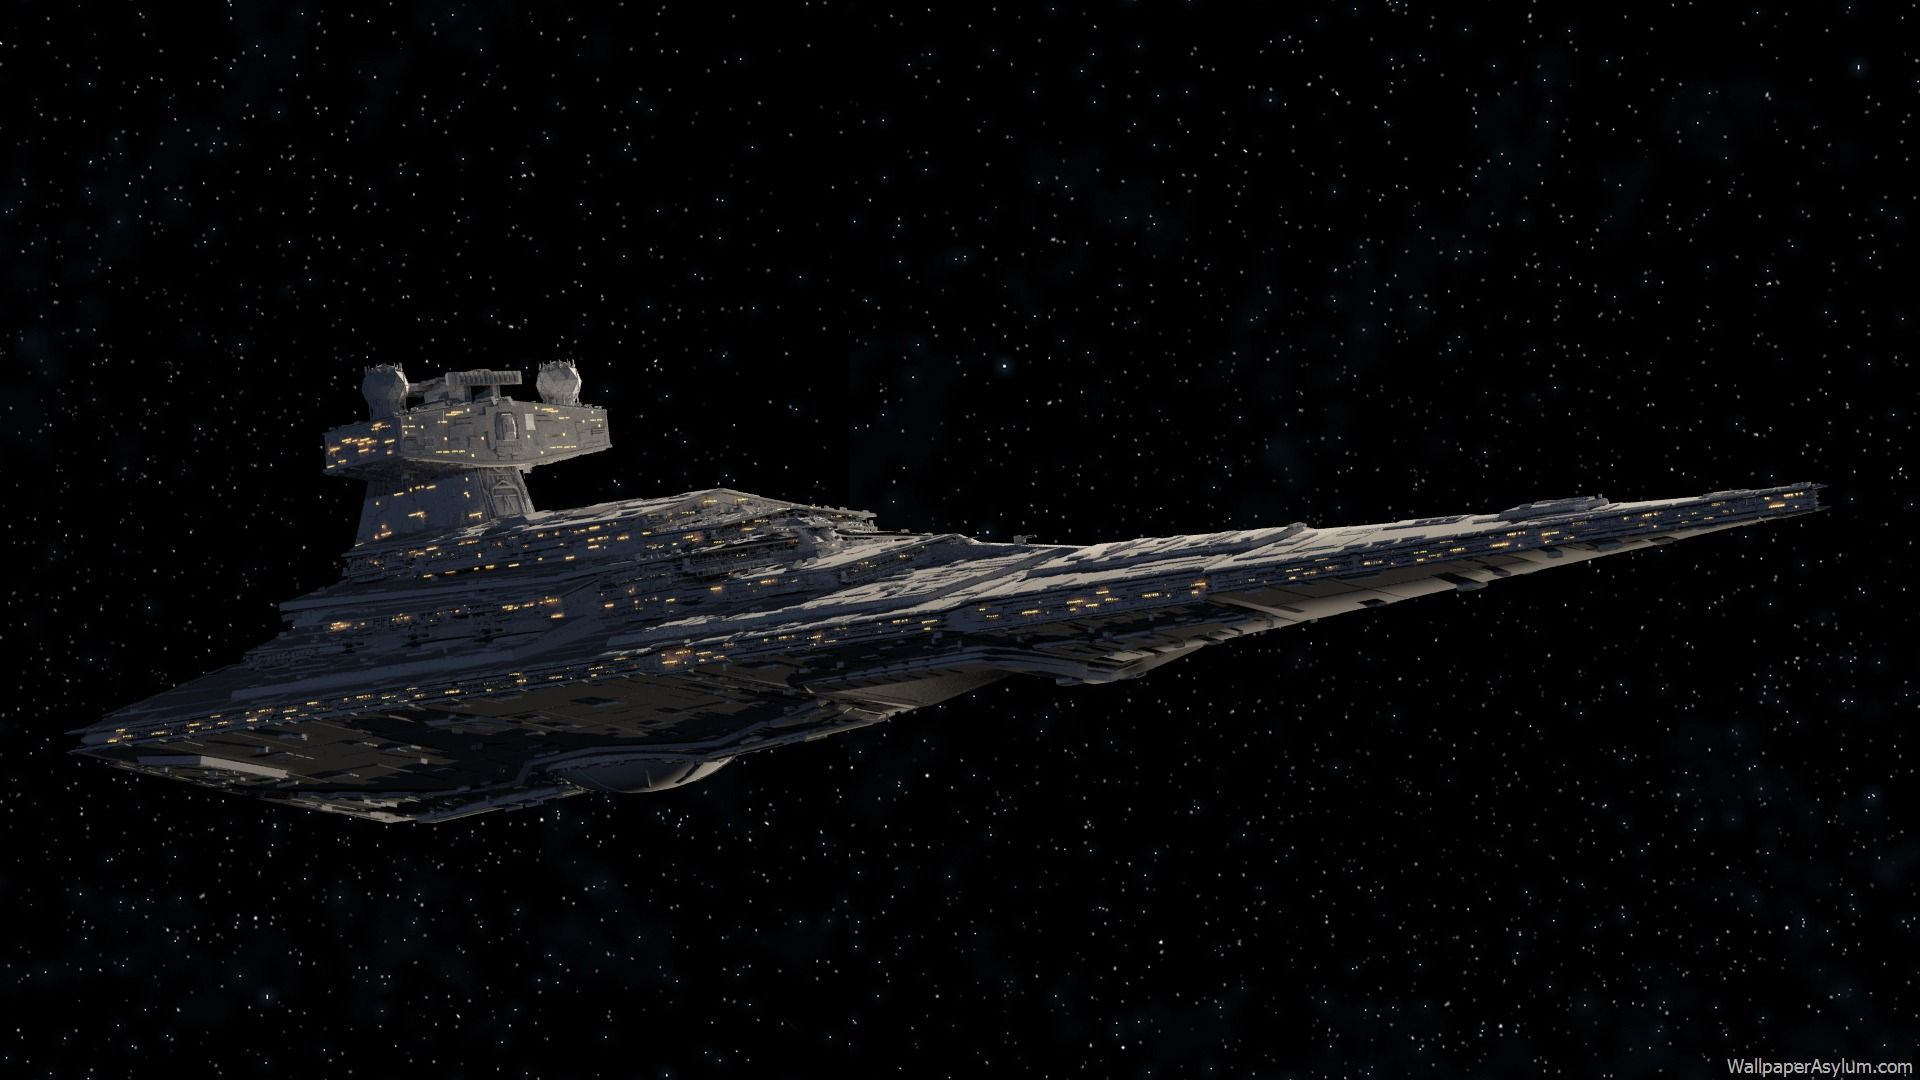 [48+] Imperial Star Destroyer Wallpaper HD on WallpaperSafari